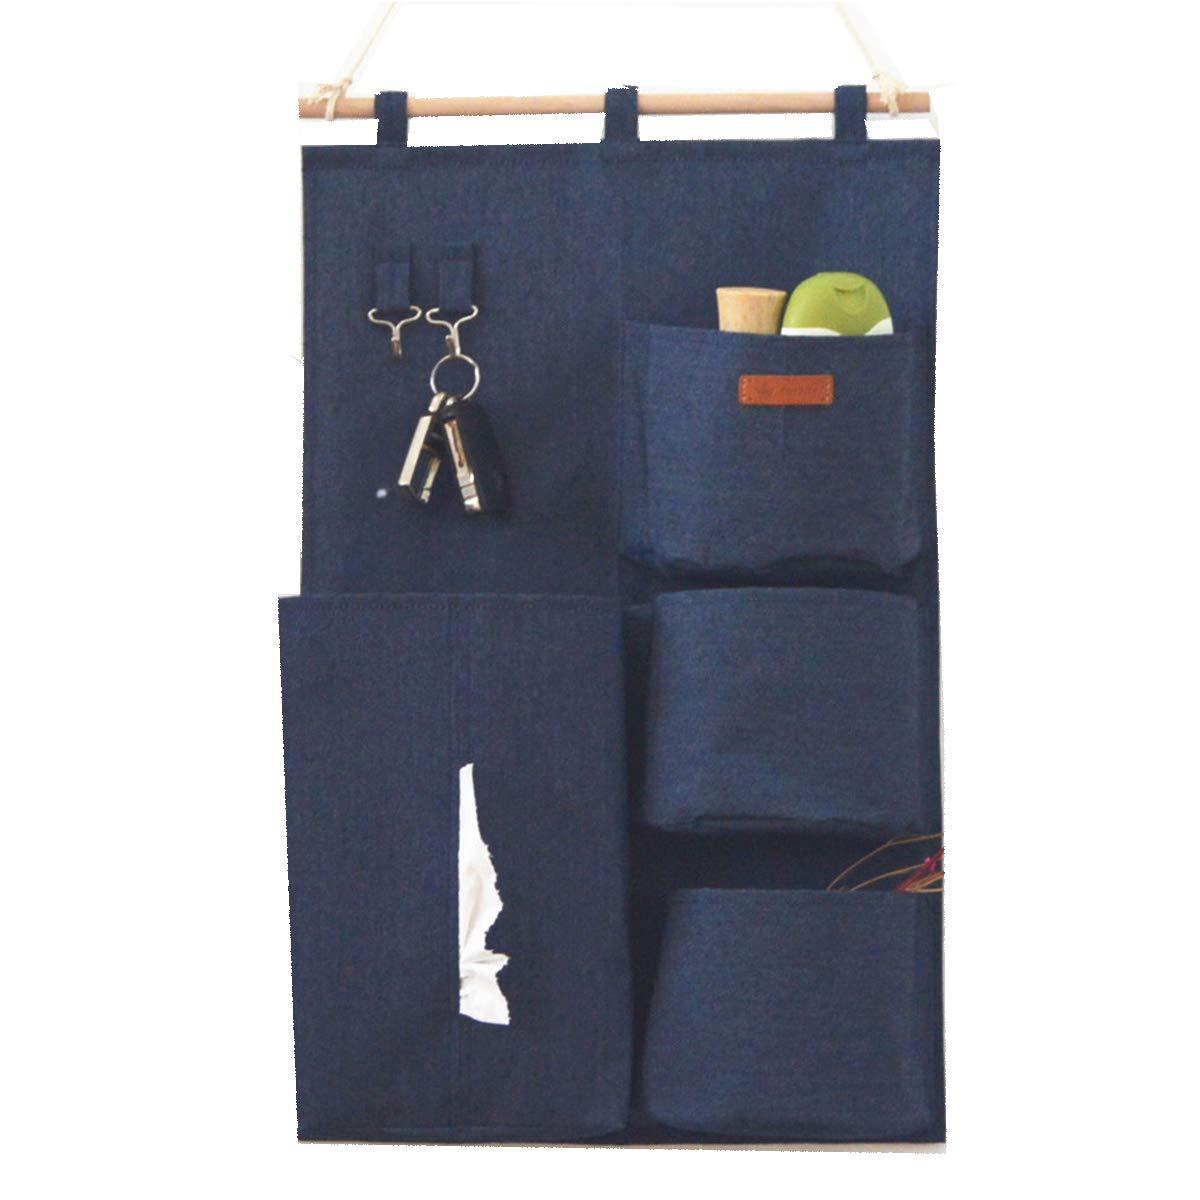 SMART HOME CHEF Denim Fabric Over Wall Door Closet Window Hanging Storage Case Organizer Bag 4-Pocket Wall Hanging Multipurpose Accessory Organizer with 2 Hooks